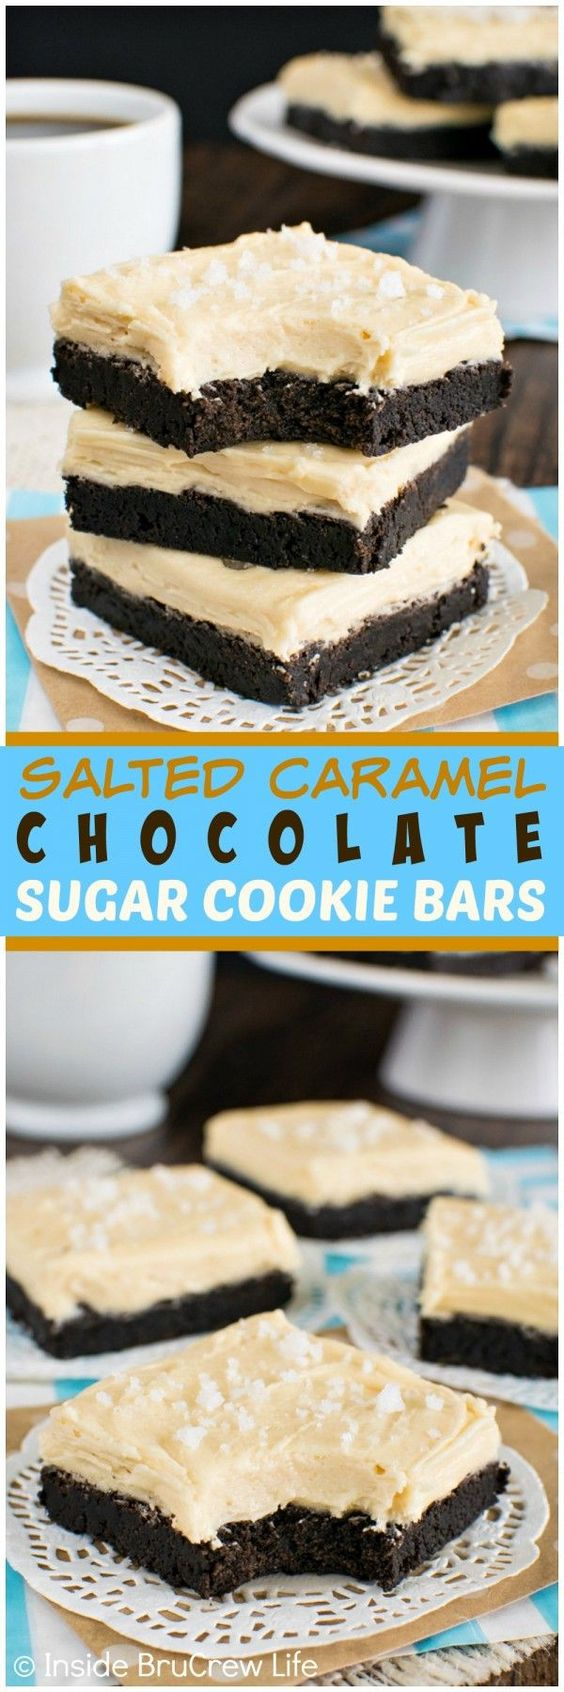 Chocolate Sugar Cookie Bars | Recipe | Salted Caramel Chocolate, Sugar ...